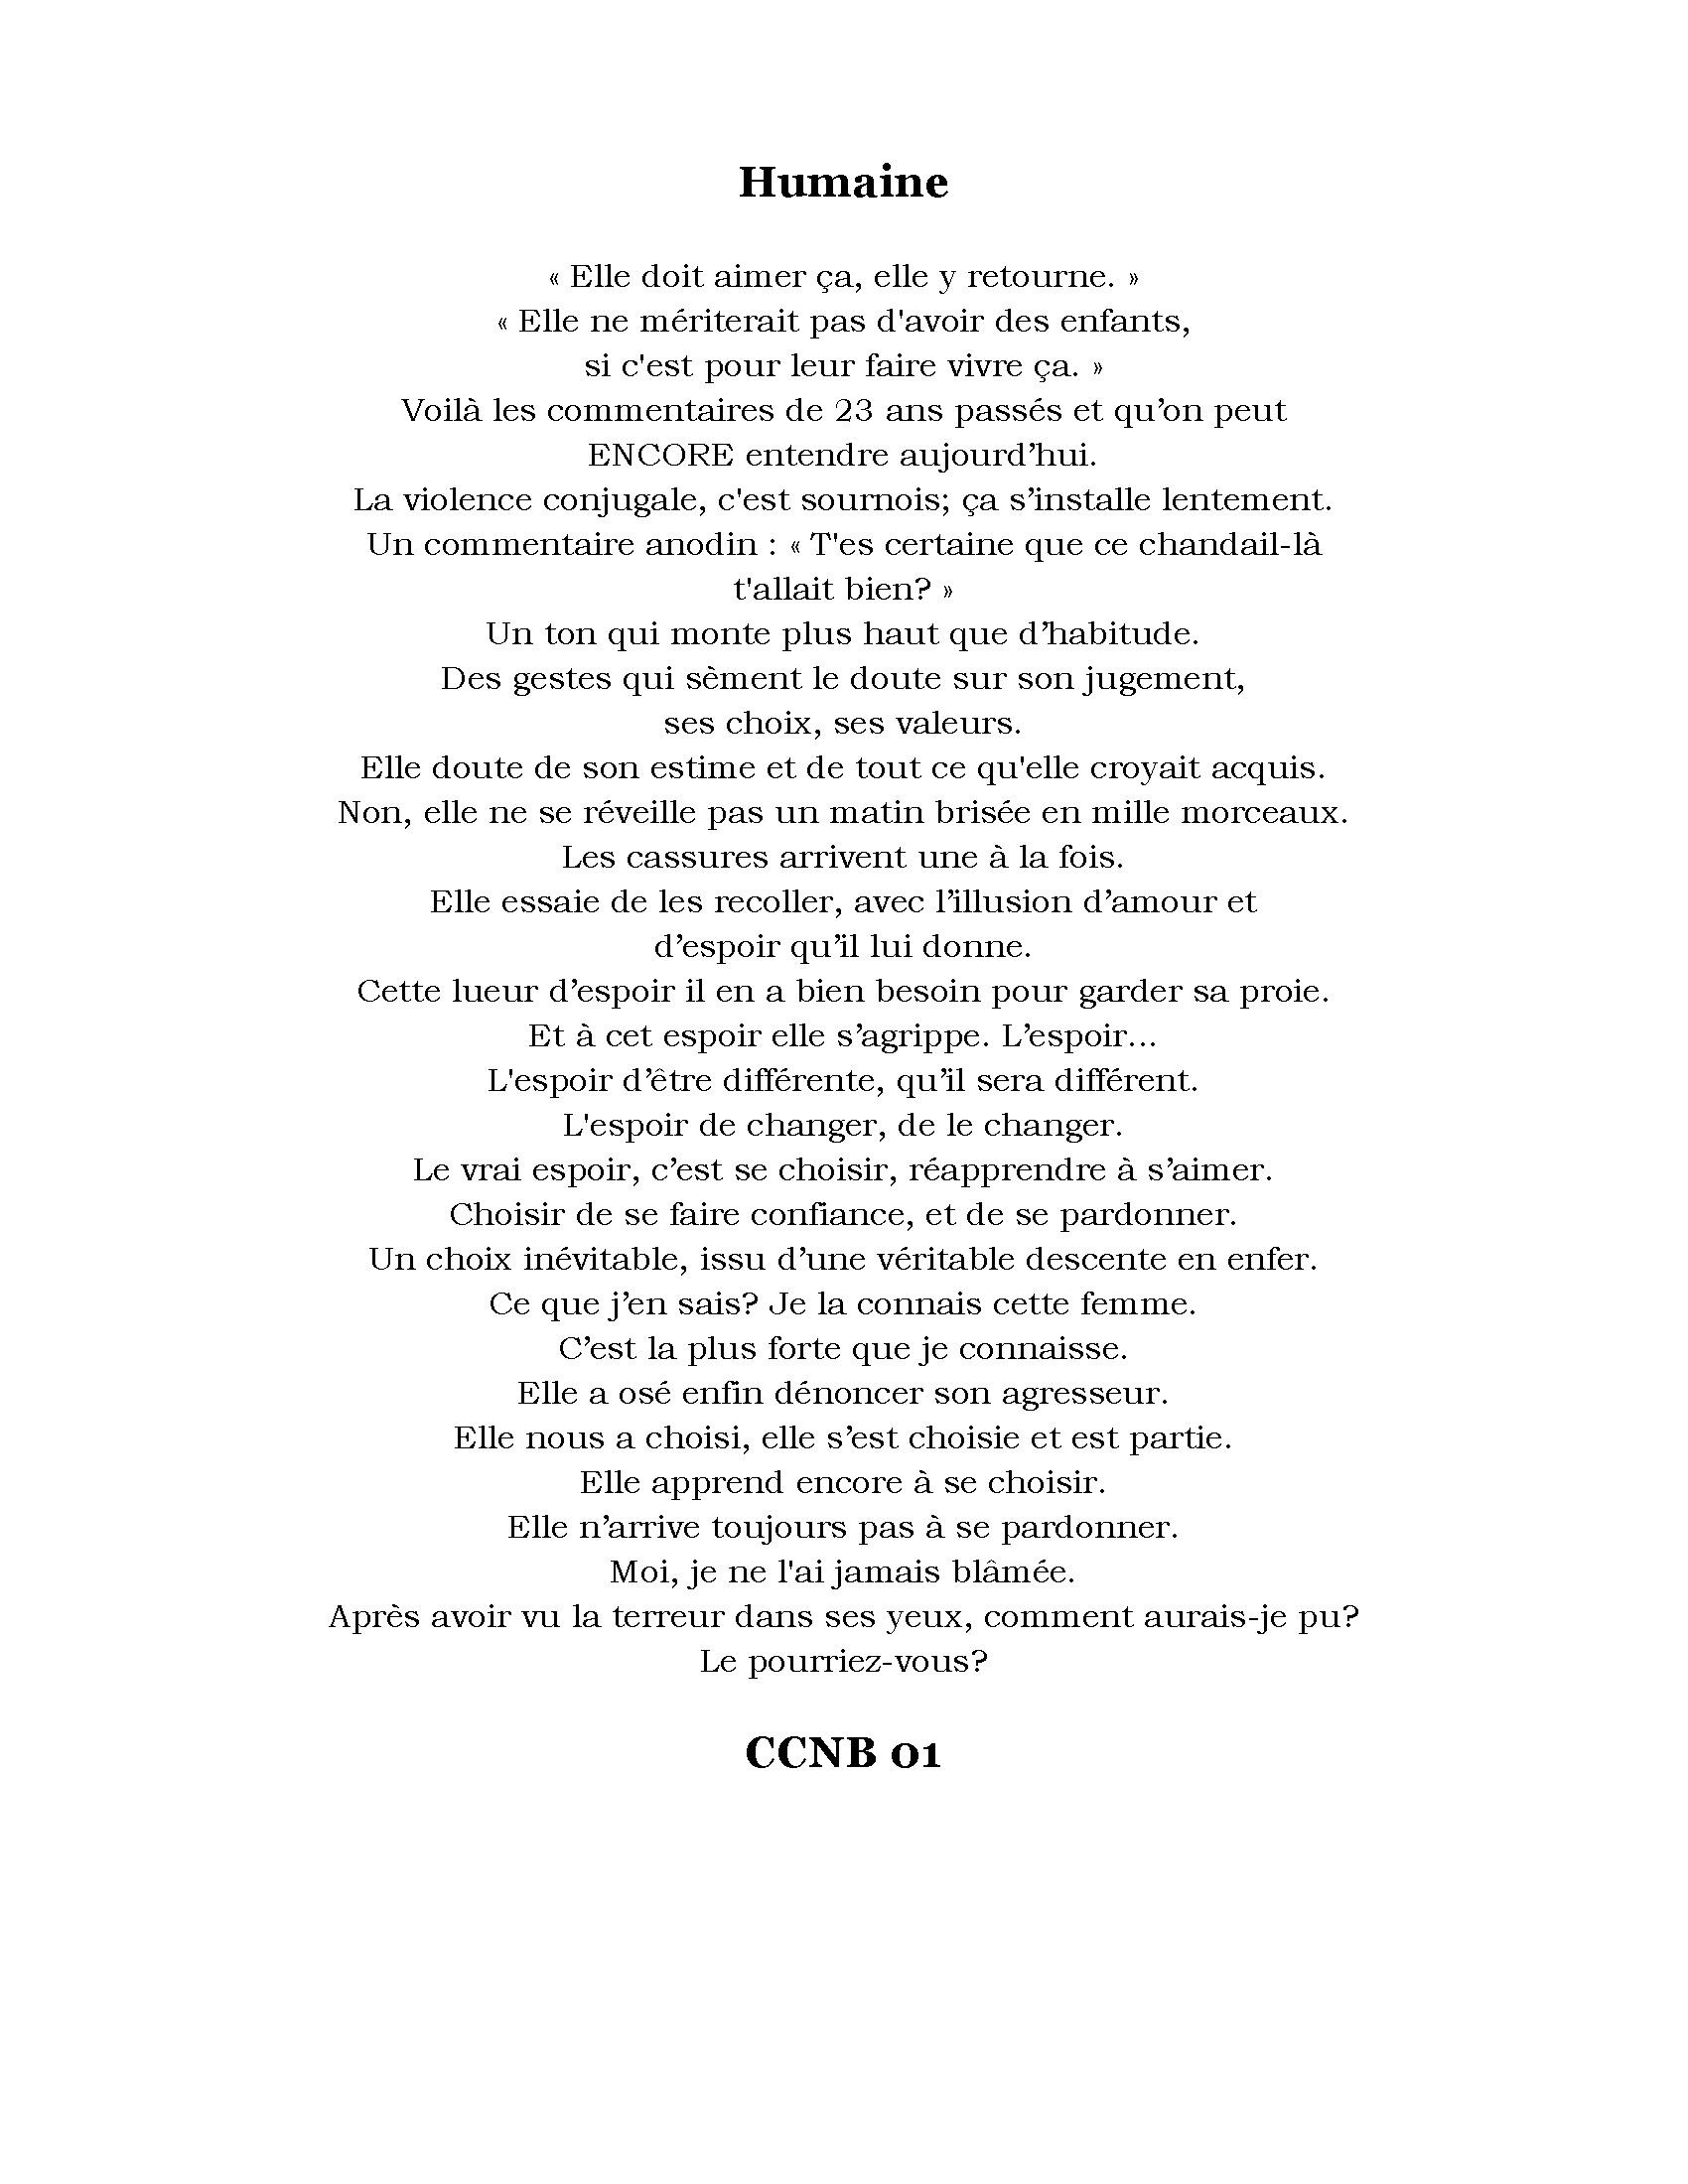 CCNB 01